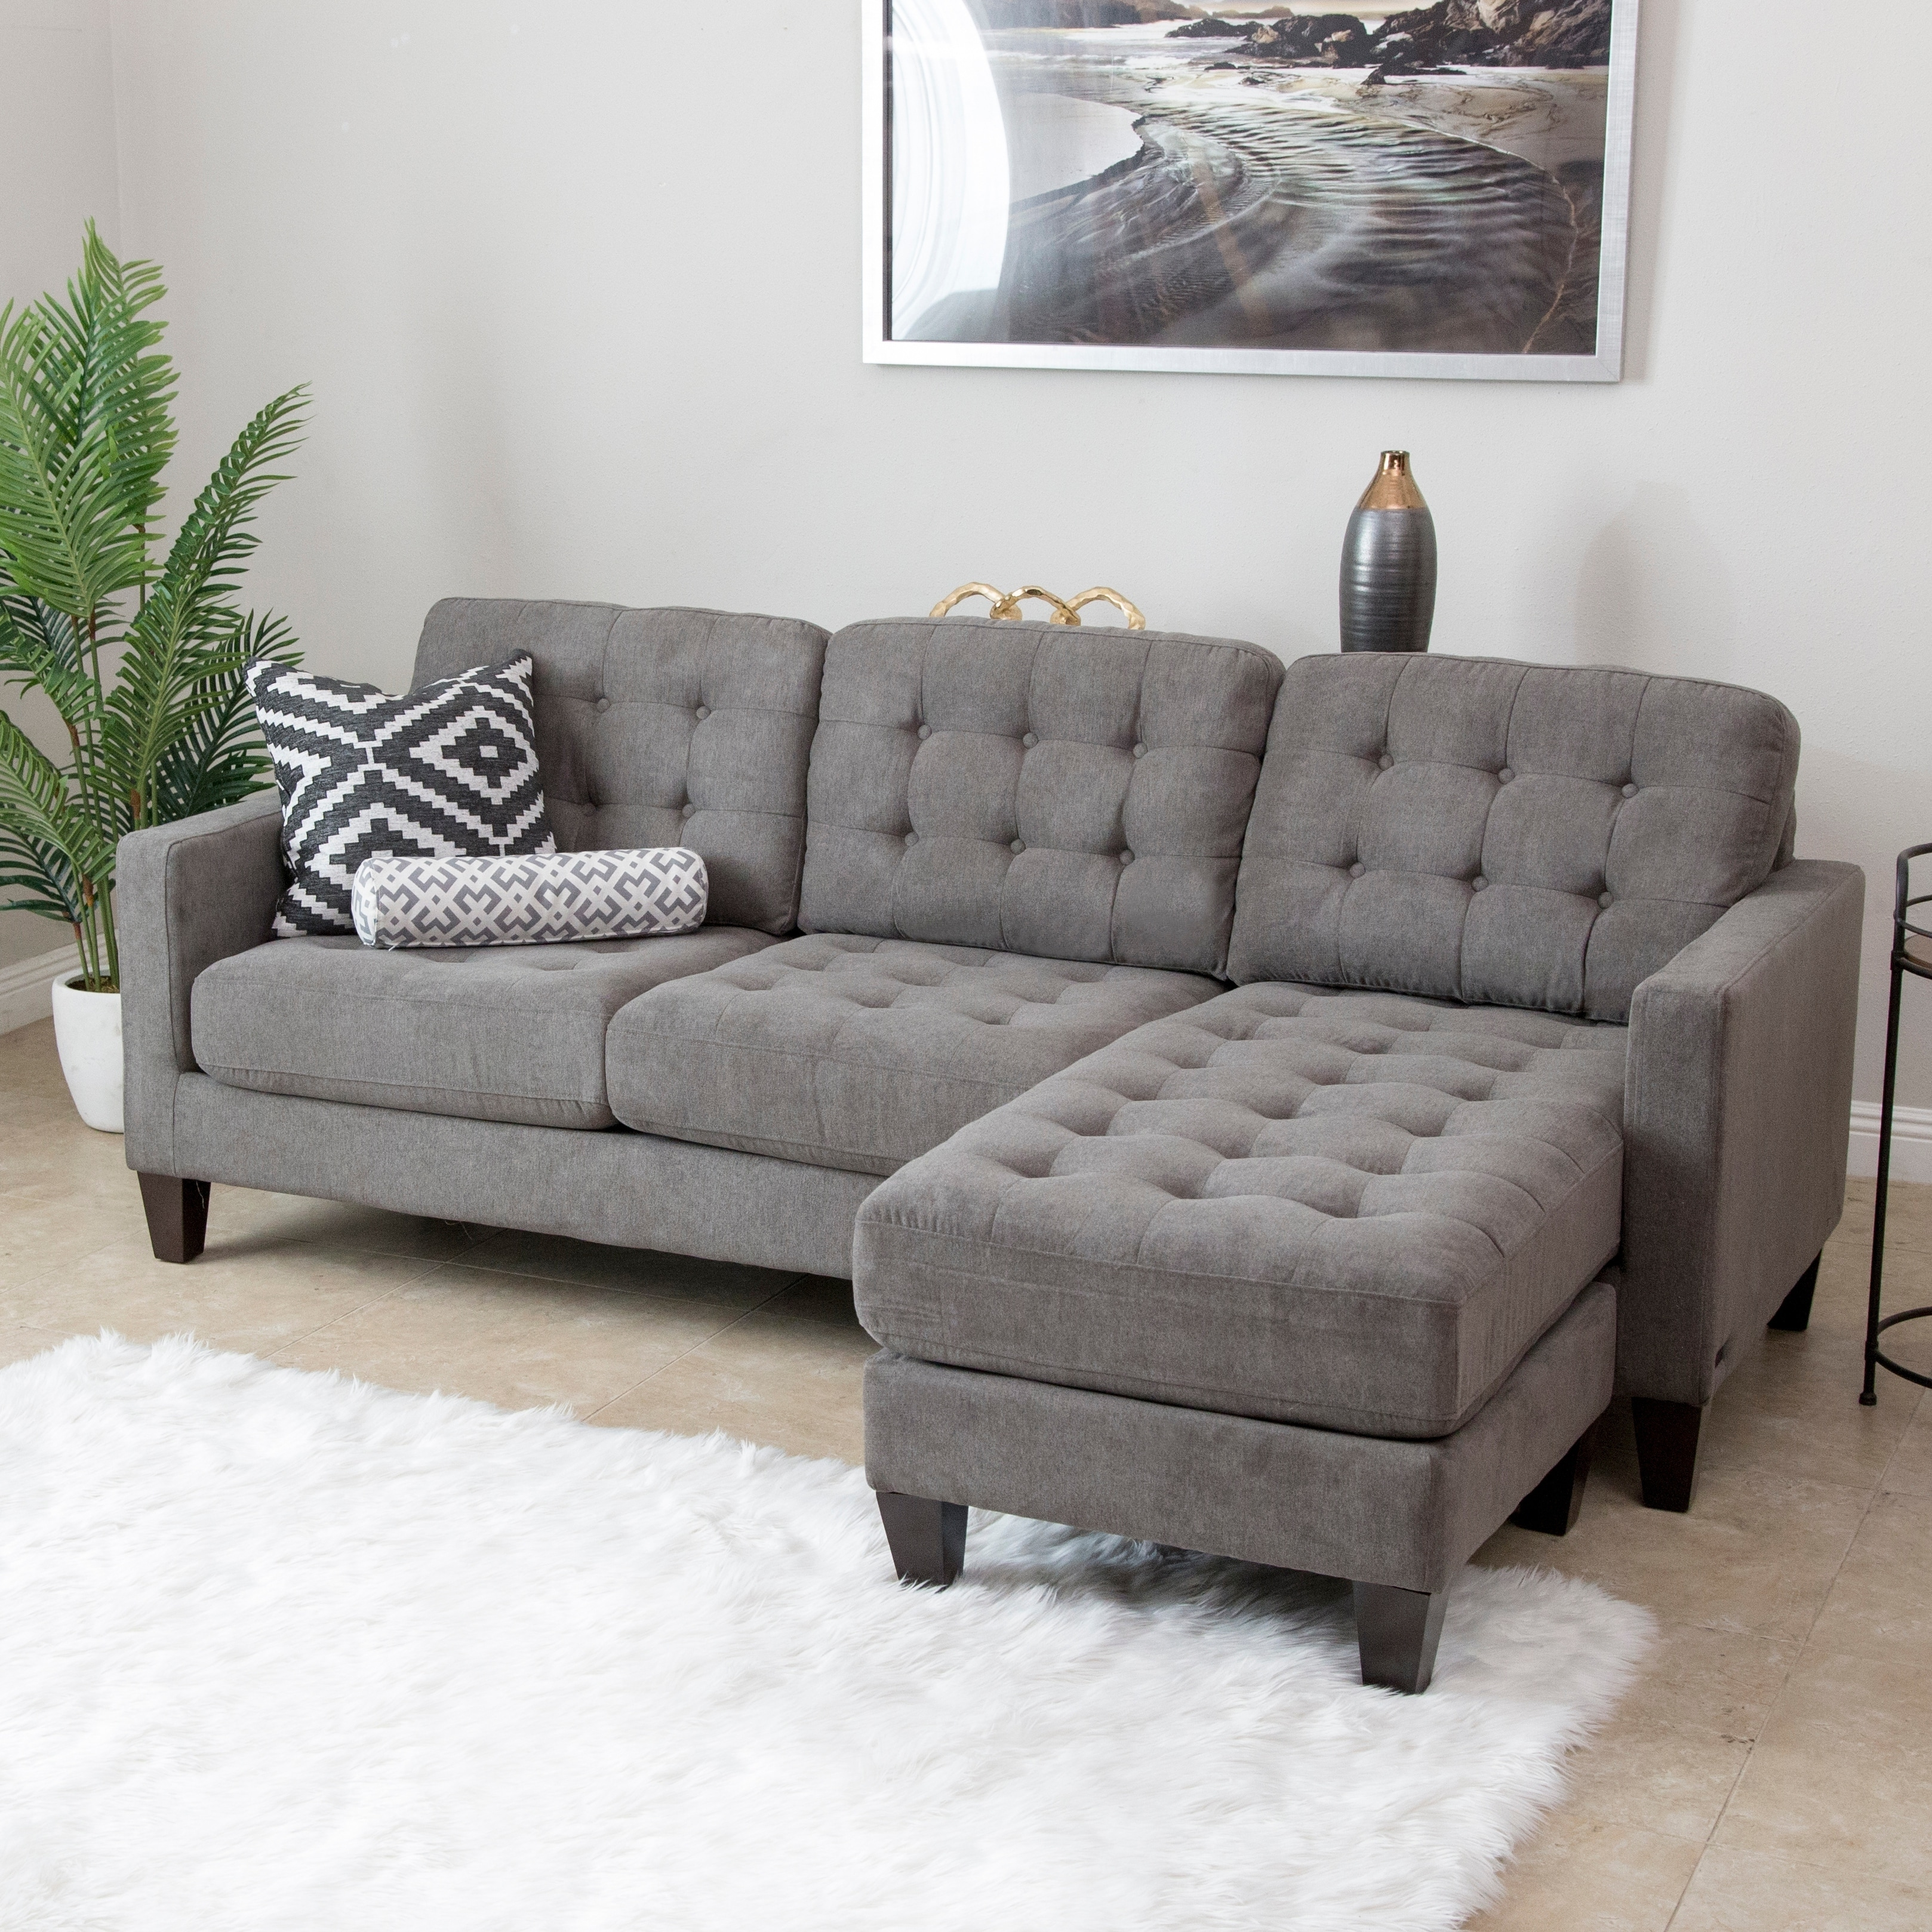 Shop Abbyson Easton Grey Fabric Reversible Sectional Sofa - On Sale ...